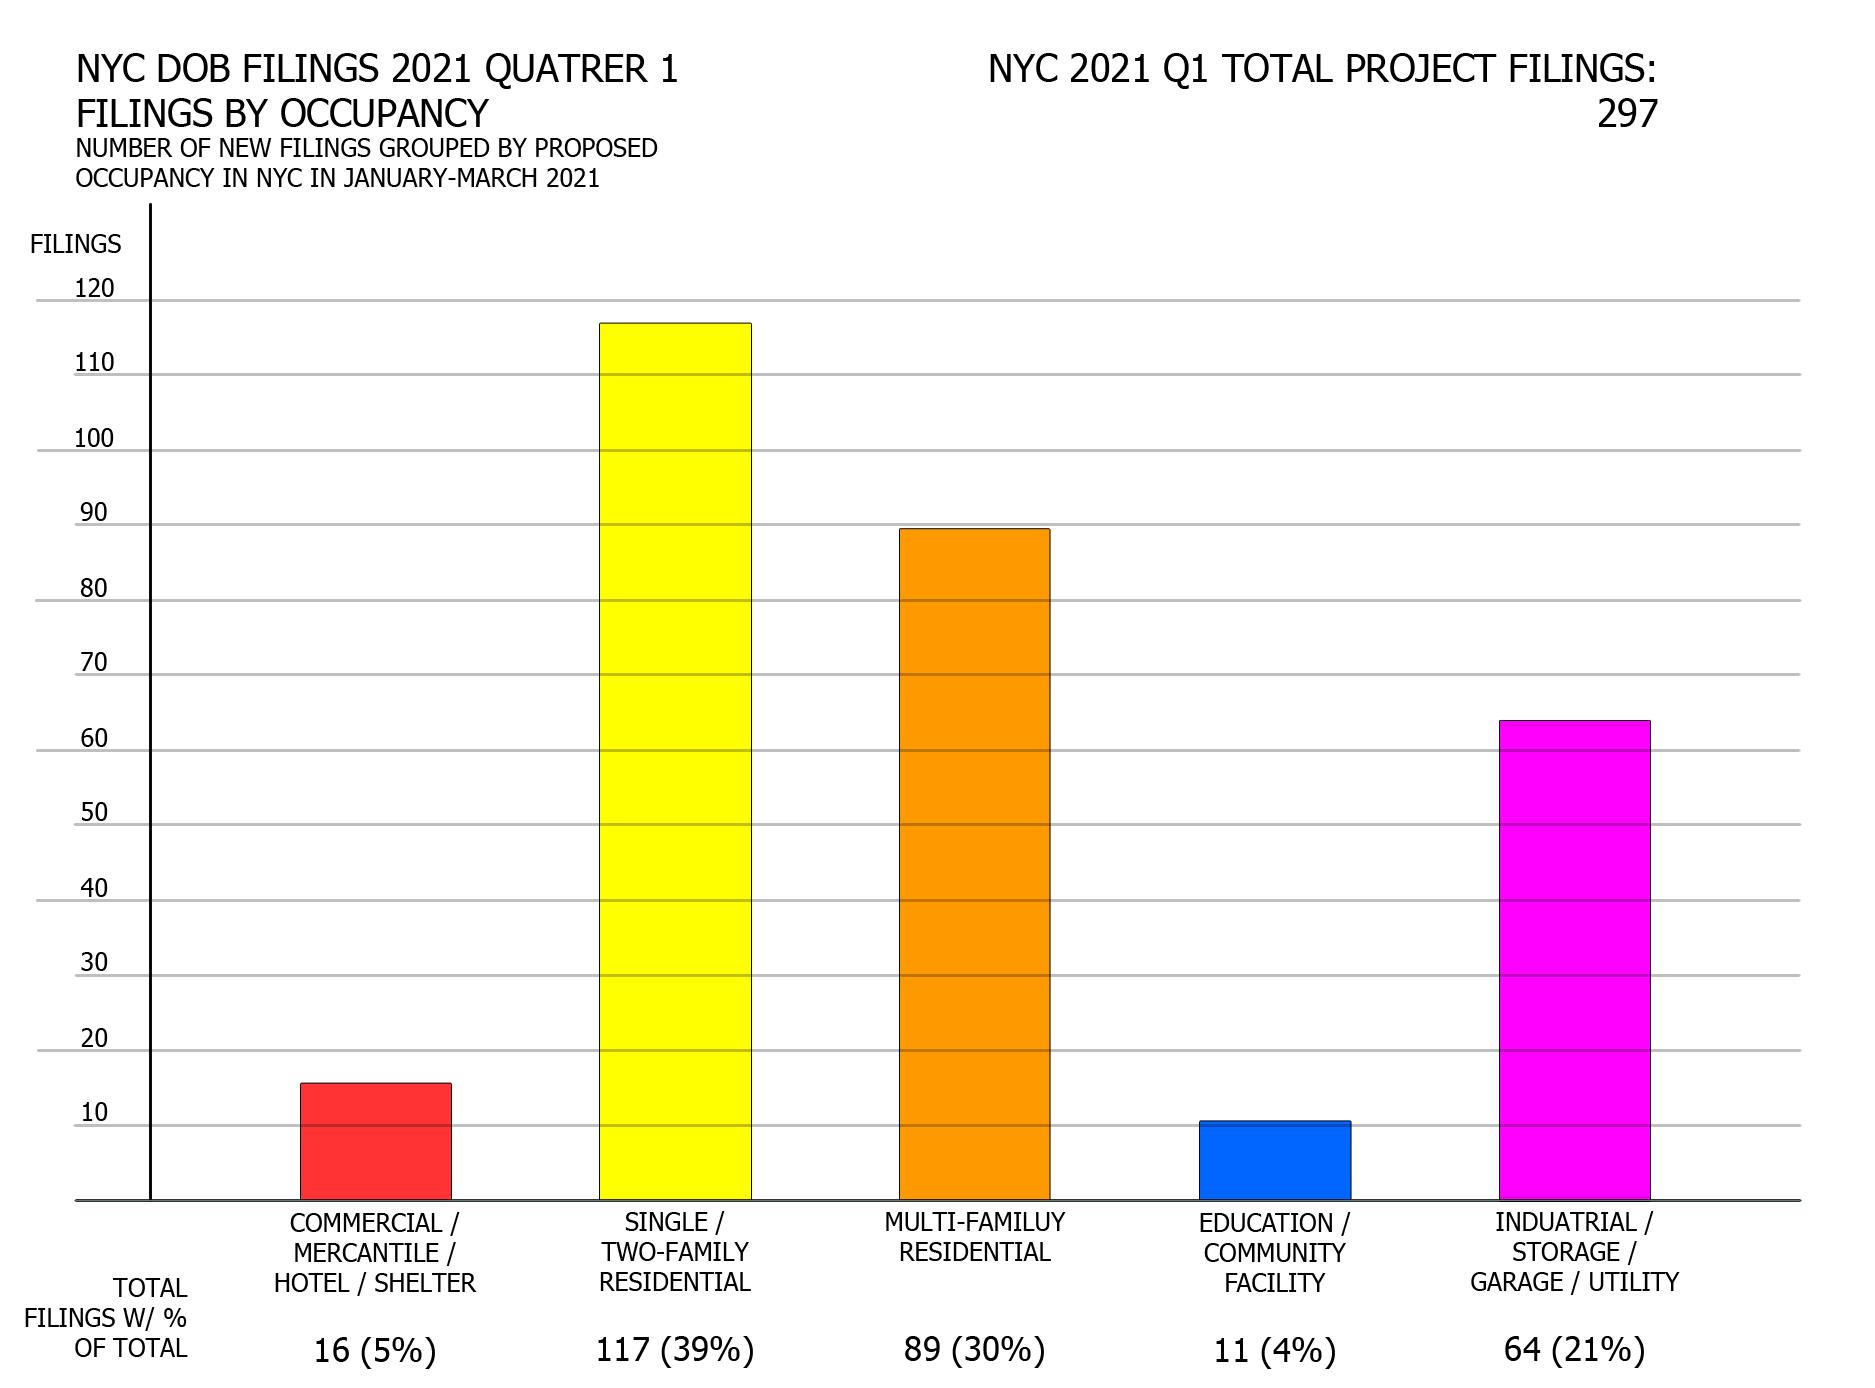 NYC DOB filings in first quarter of 2021 by occupancy. Credit: Vitali Ogorodnikov